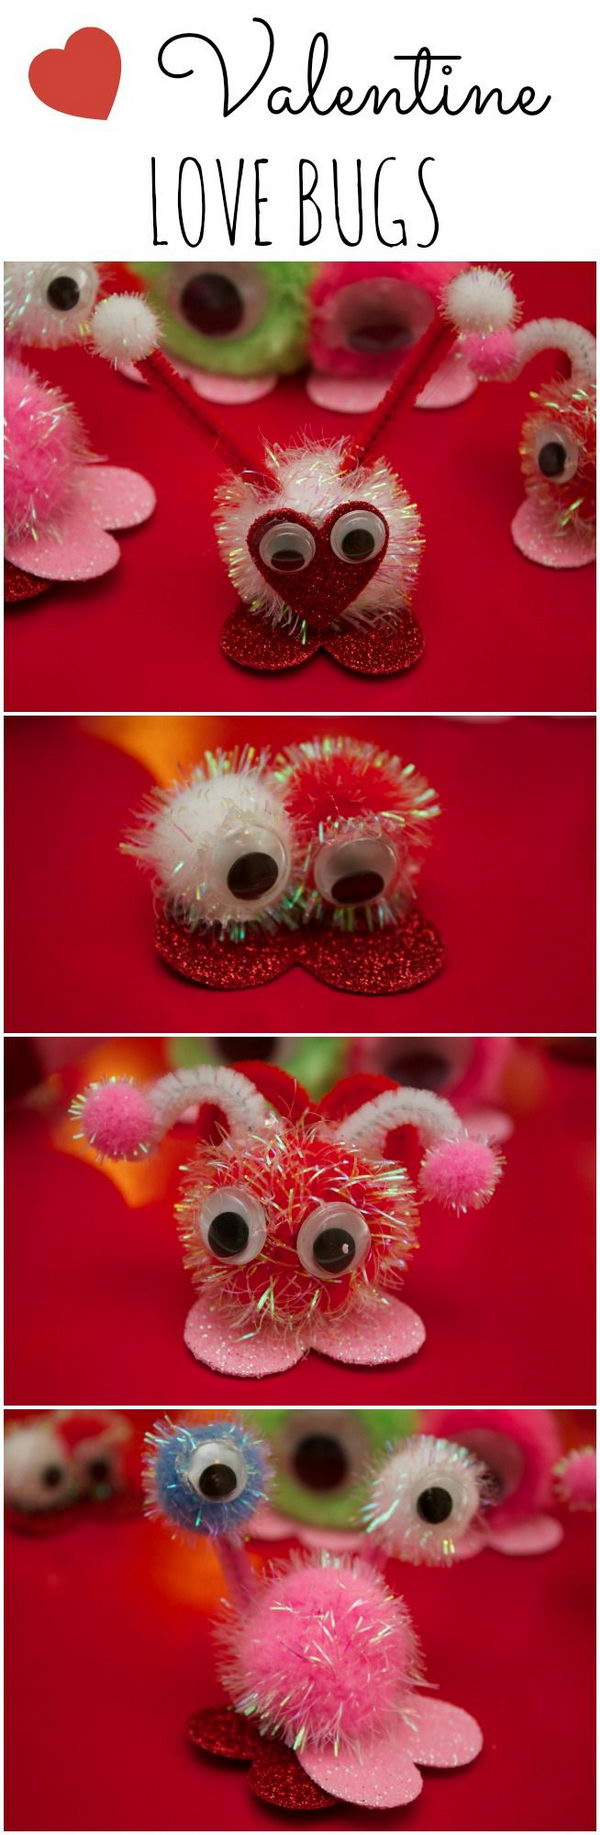 Valentine's Day Love Bugs.